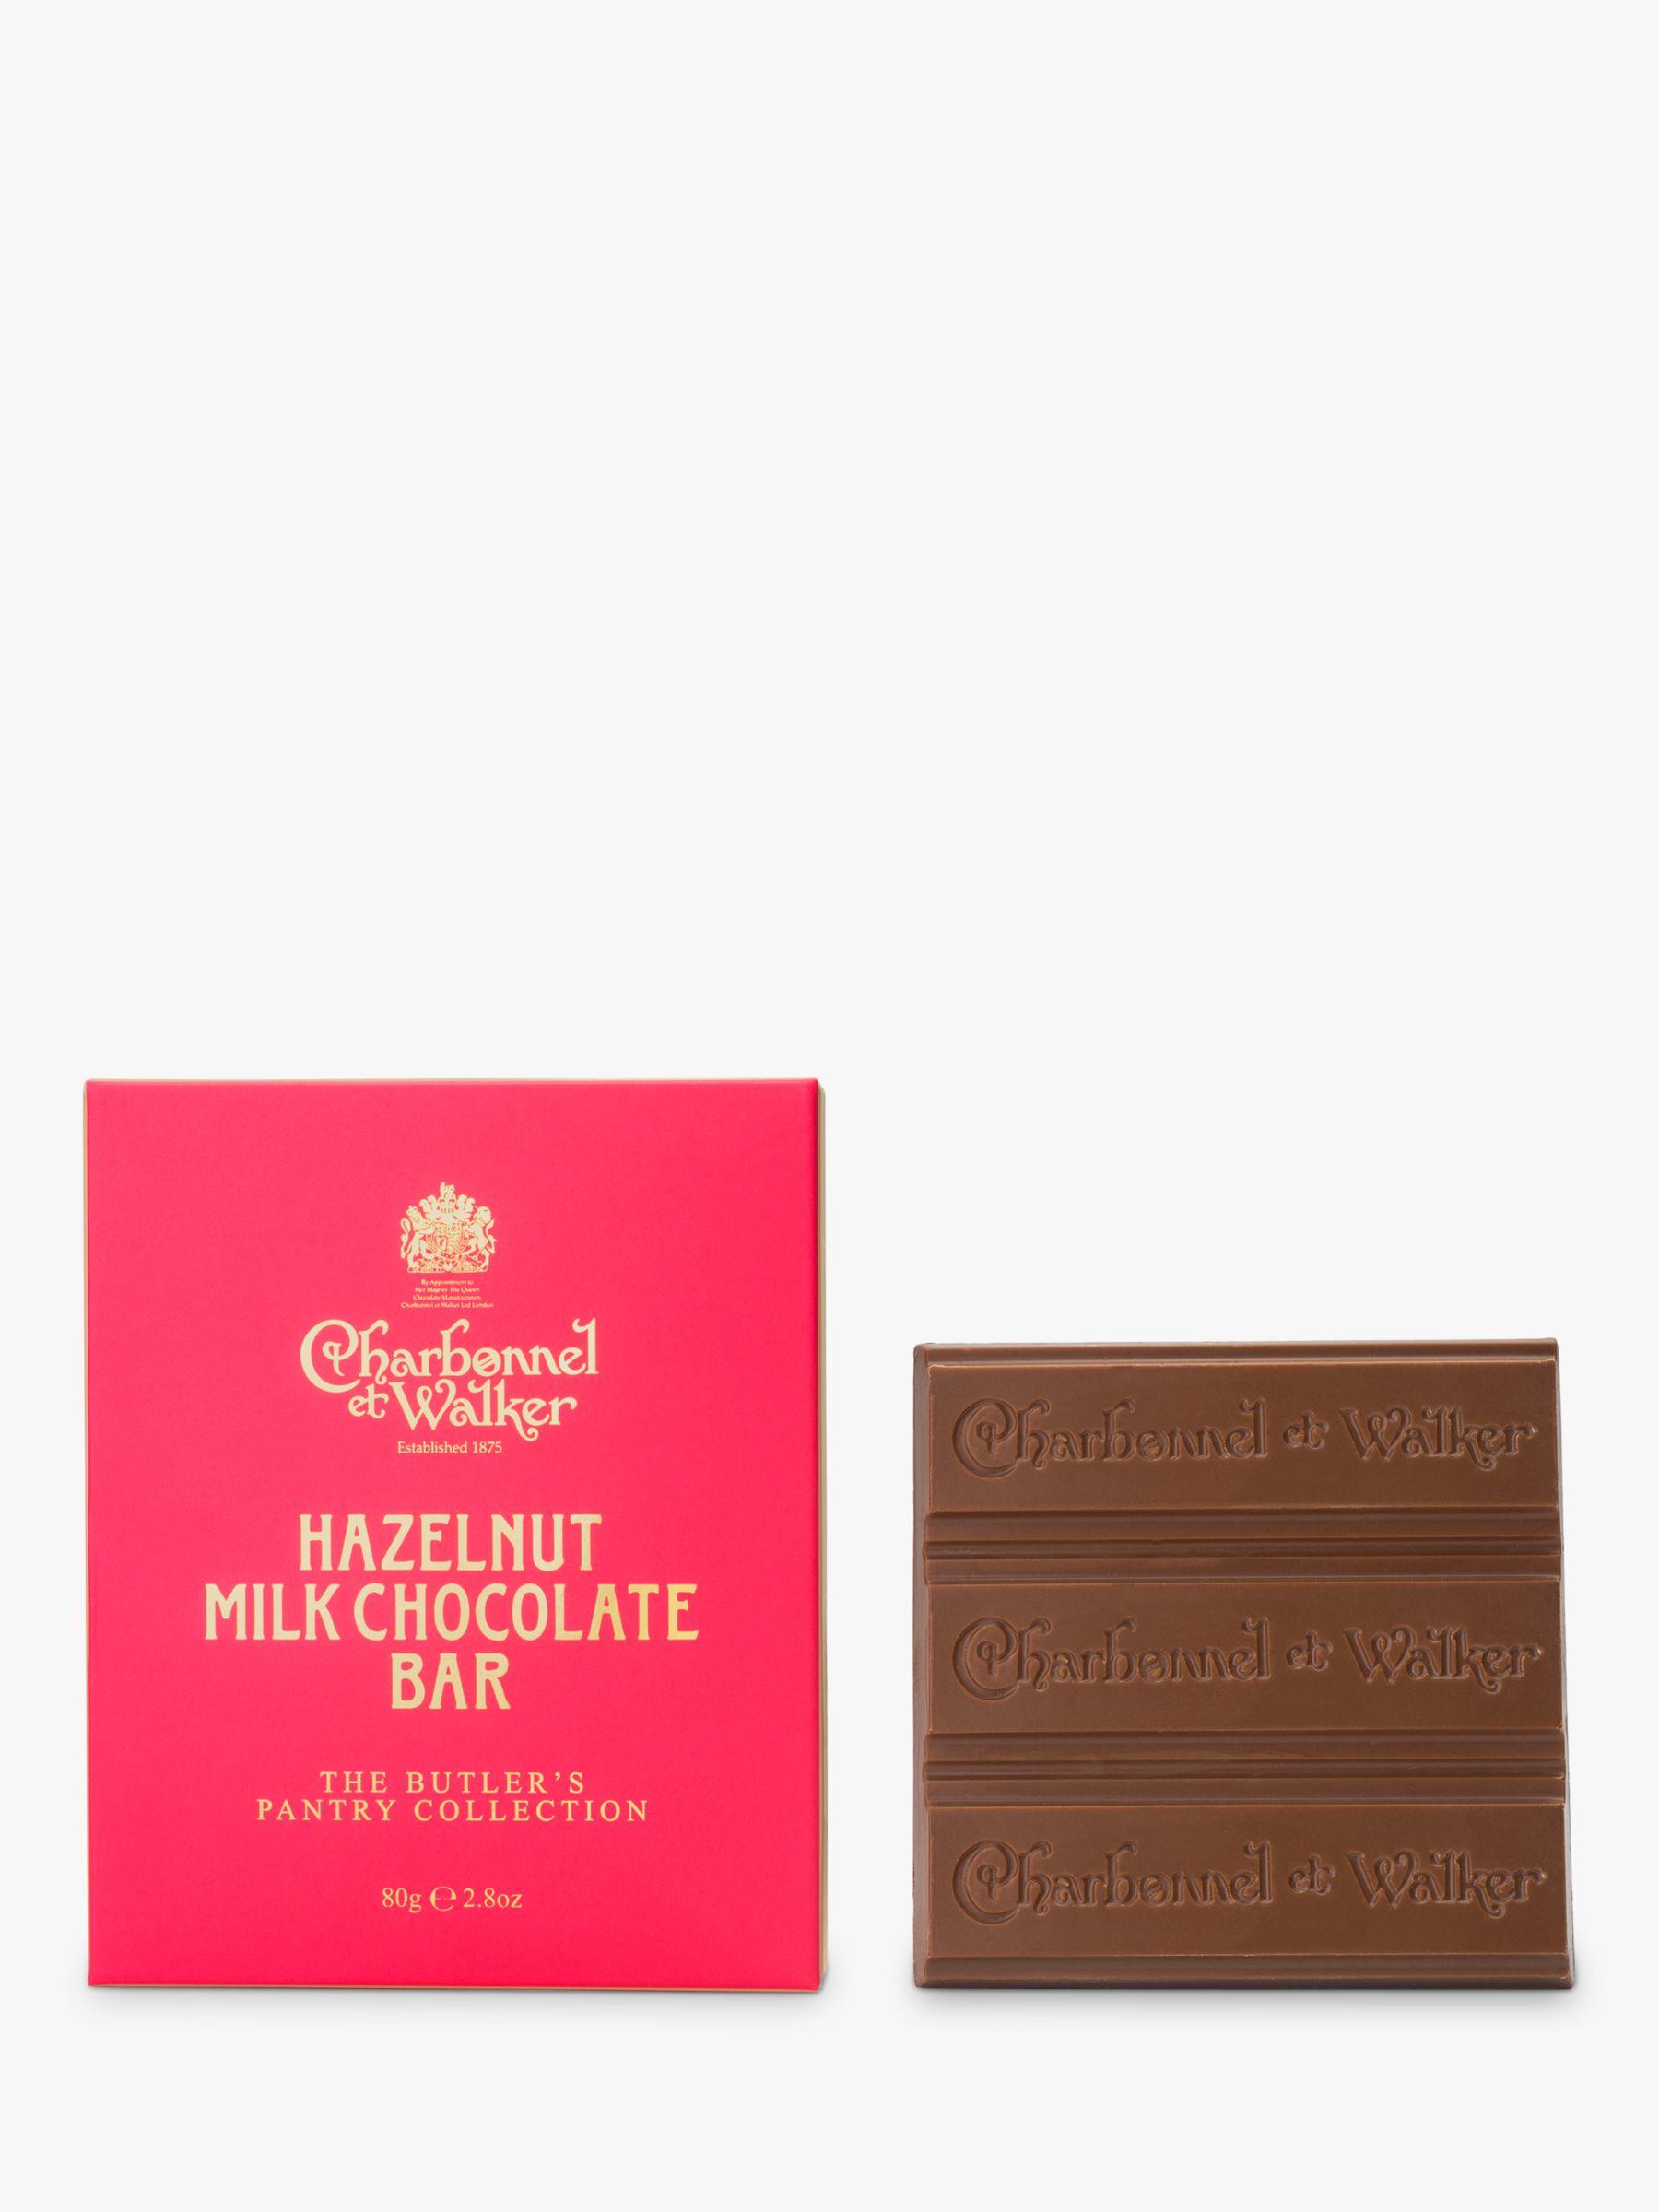 Charbonnel et Walker Charbonnel et Walker Butler's Pantry Collection Hazelnut Milk Chocolate Bar, 80g